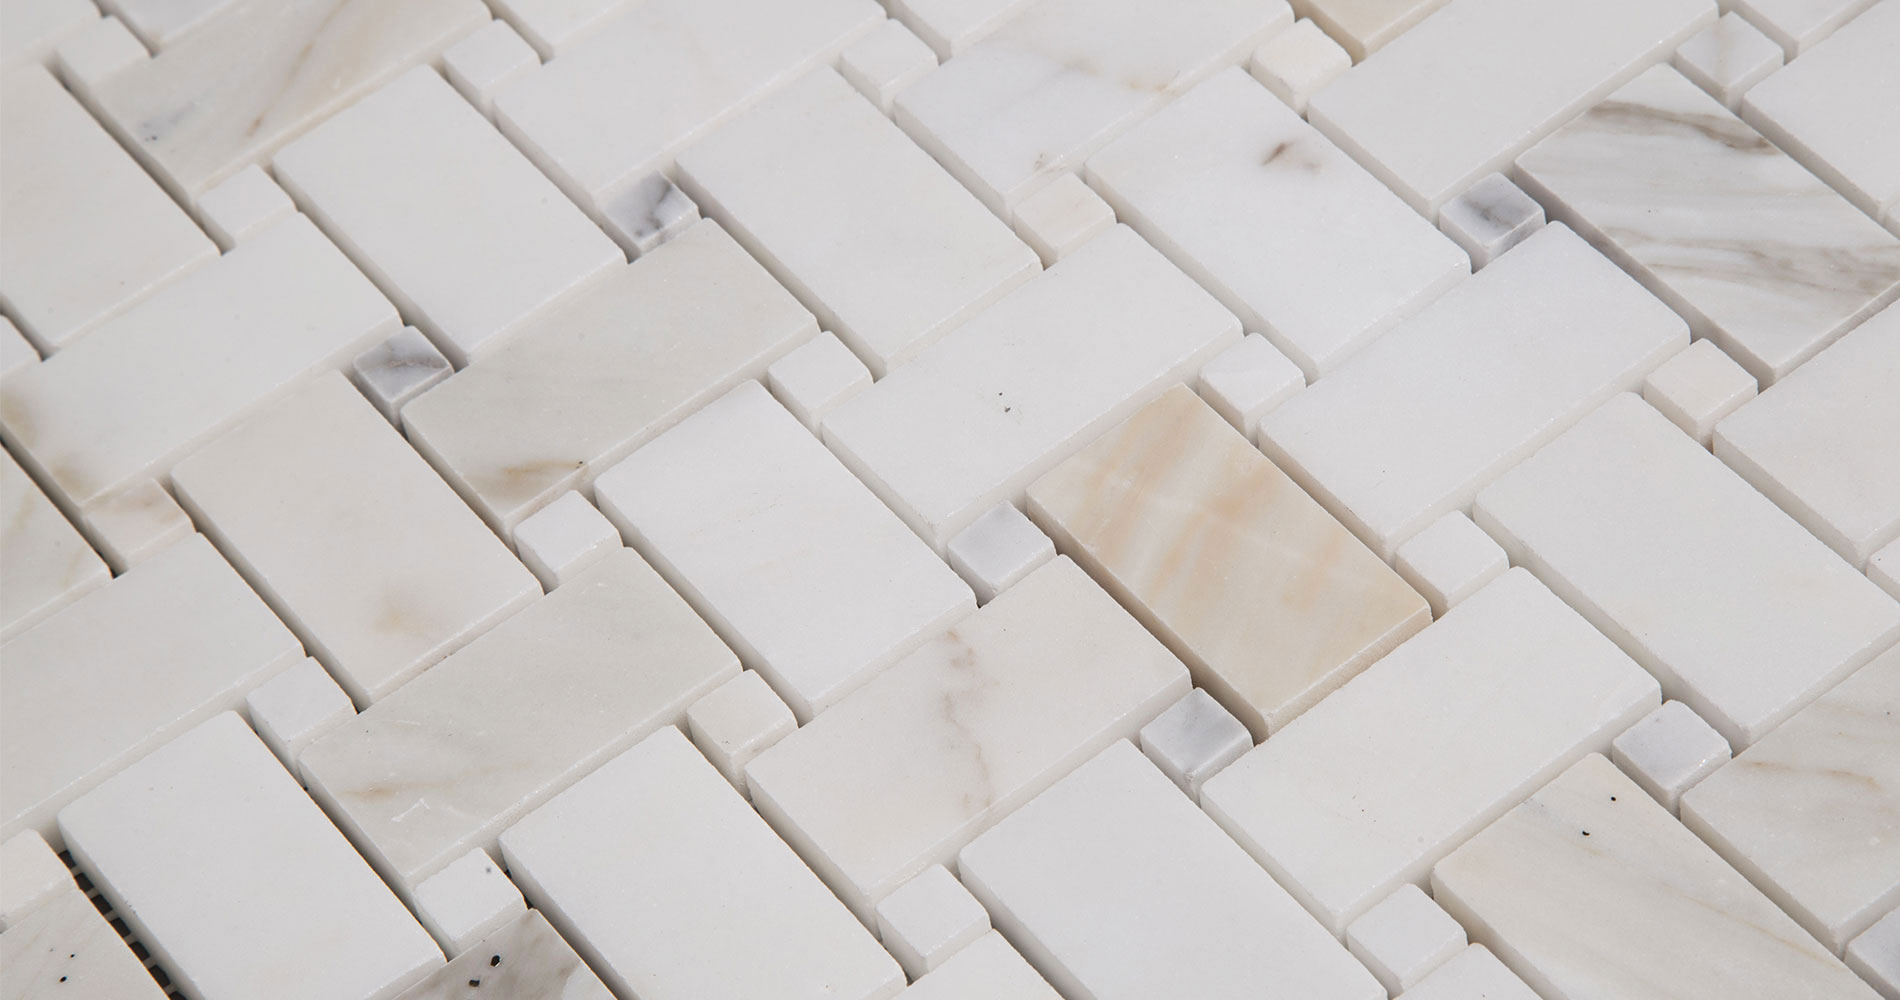 centurymosaic-Calacatta-Gold-Marble-Basketweave-Mosaic-Tile-Collection-8